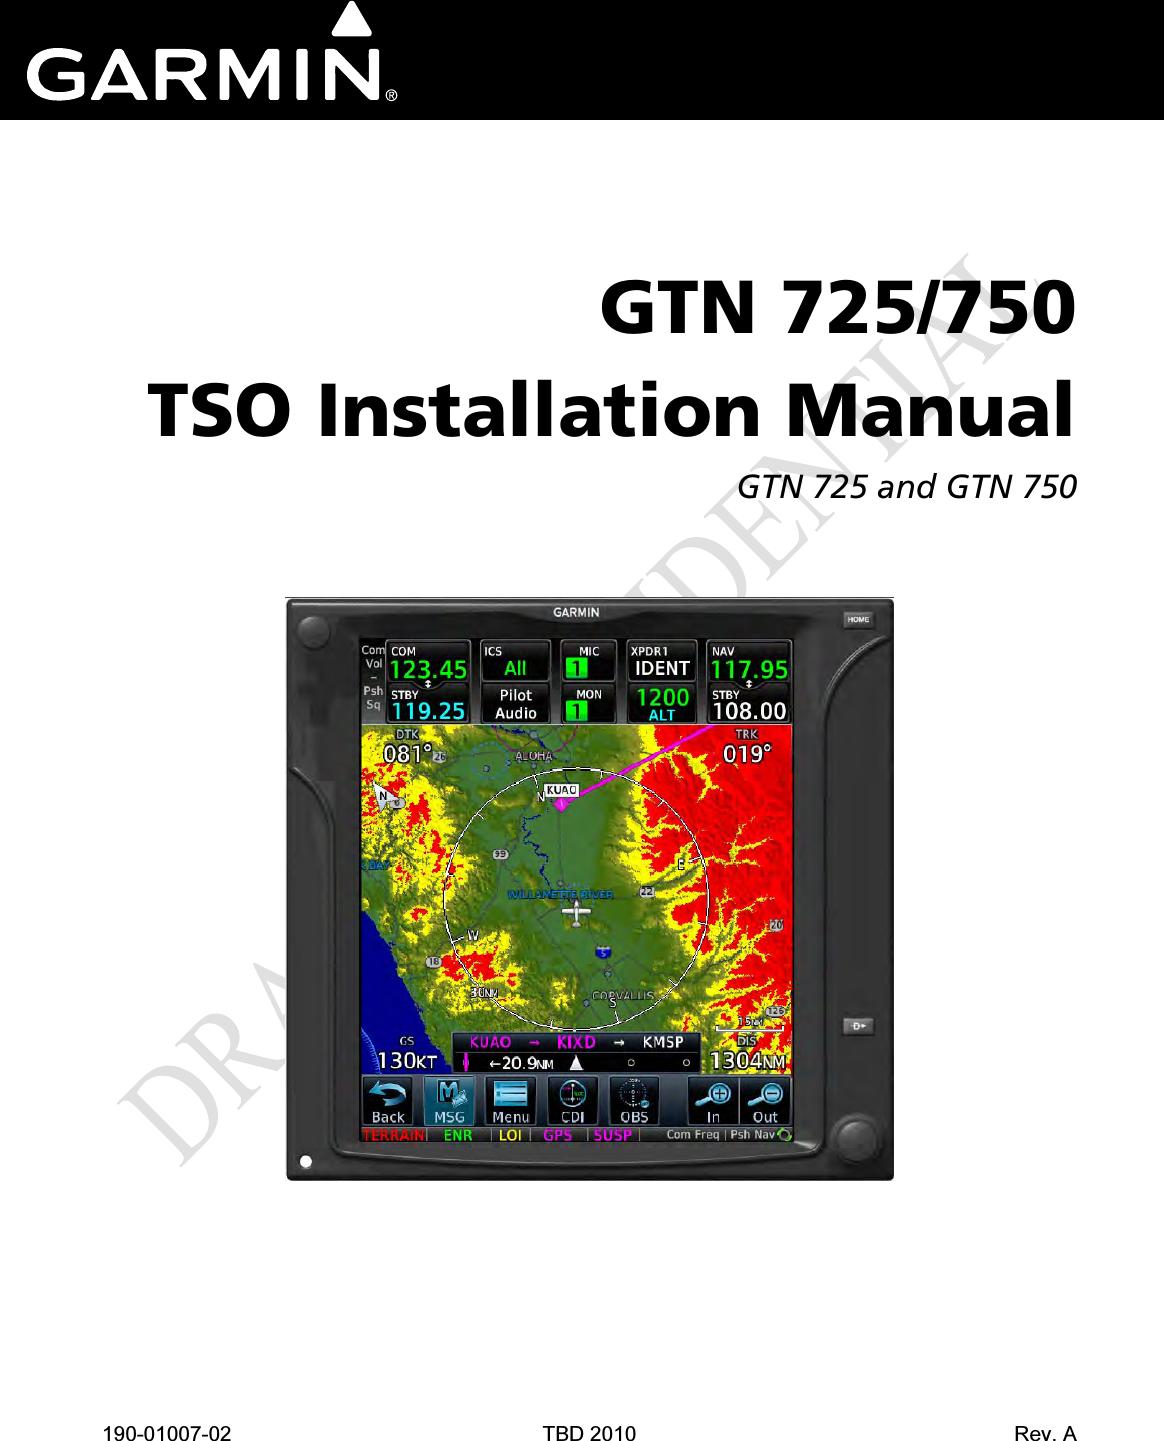 garmin 01594 airborne communications transceiver user manual 190 rh usermanual wiki garmin gps 750 user manual Garmin 750 Aviation